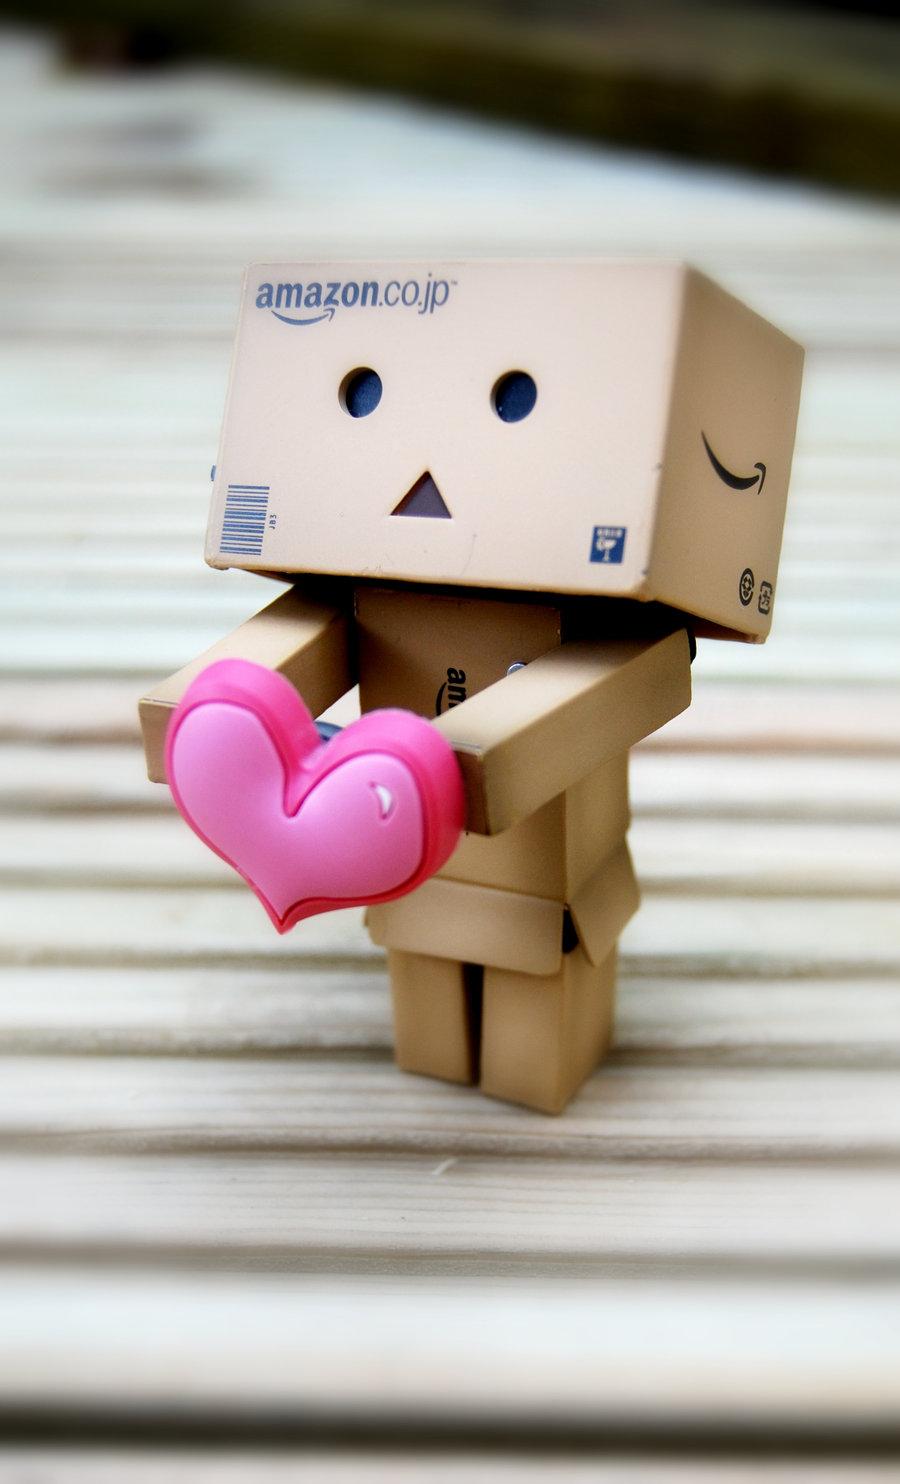 http://4.bp.blogspot.com/_wAu2SUbV9uE/TKwbimRfarI/AAAAAAAAAhg/SaI7NvVL_Jo/s1600/Danbo_loves_you__by_BeciAnne.jpg